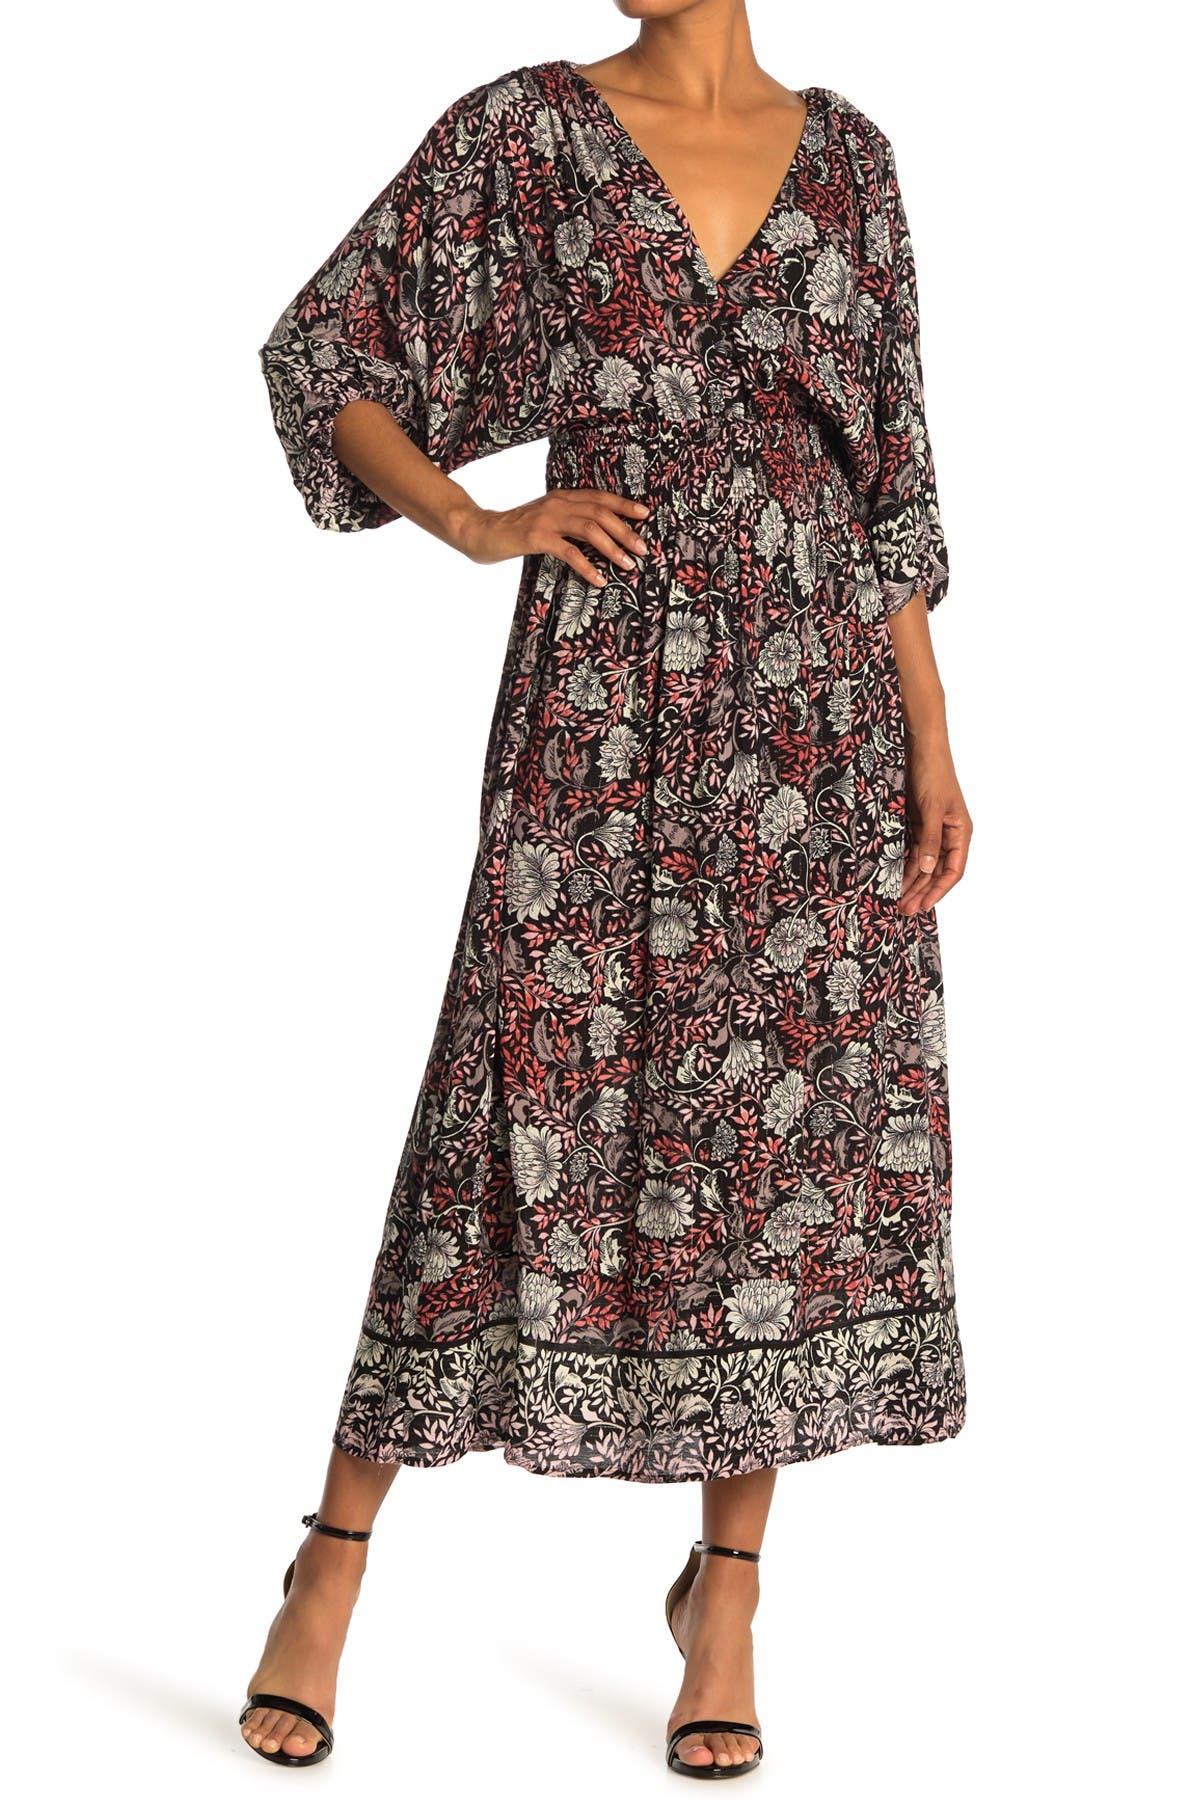 Image of Love Stitch Floral Midi Dress